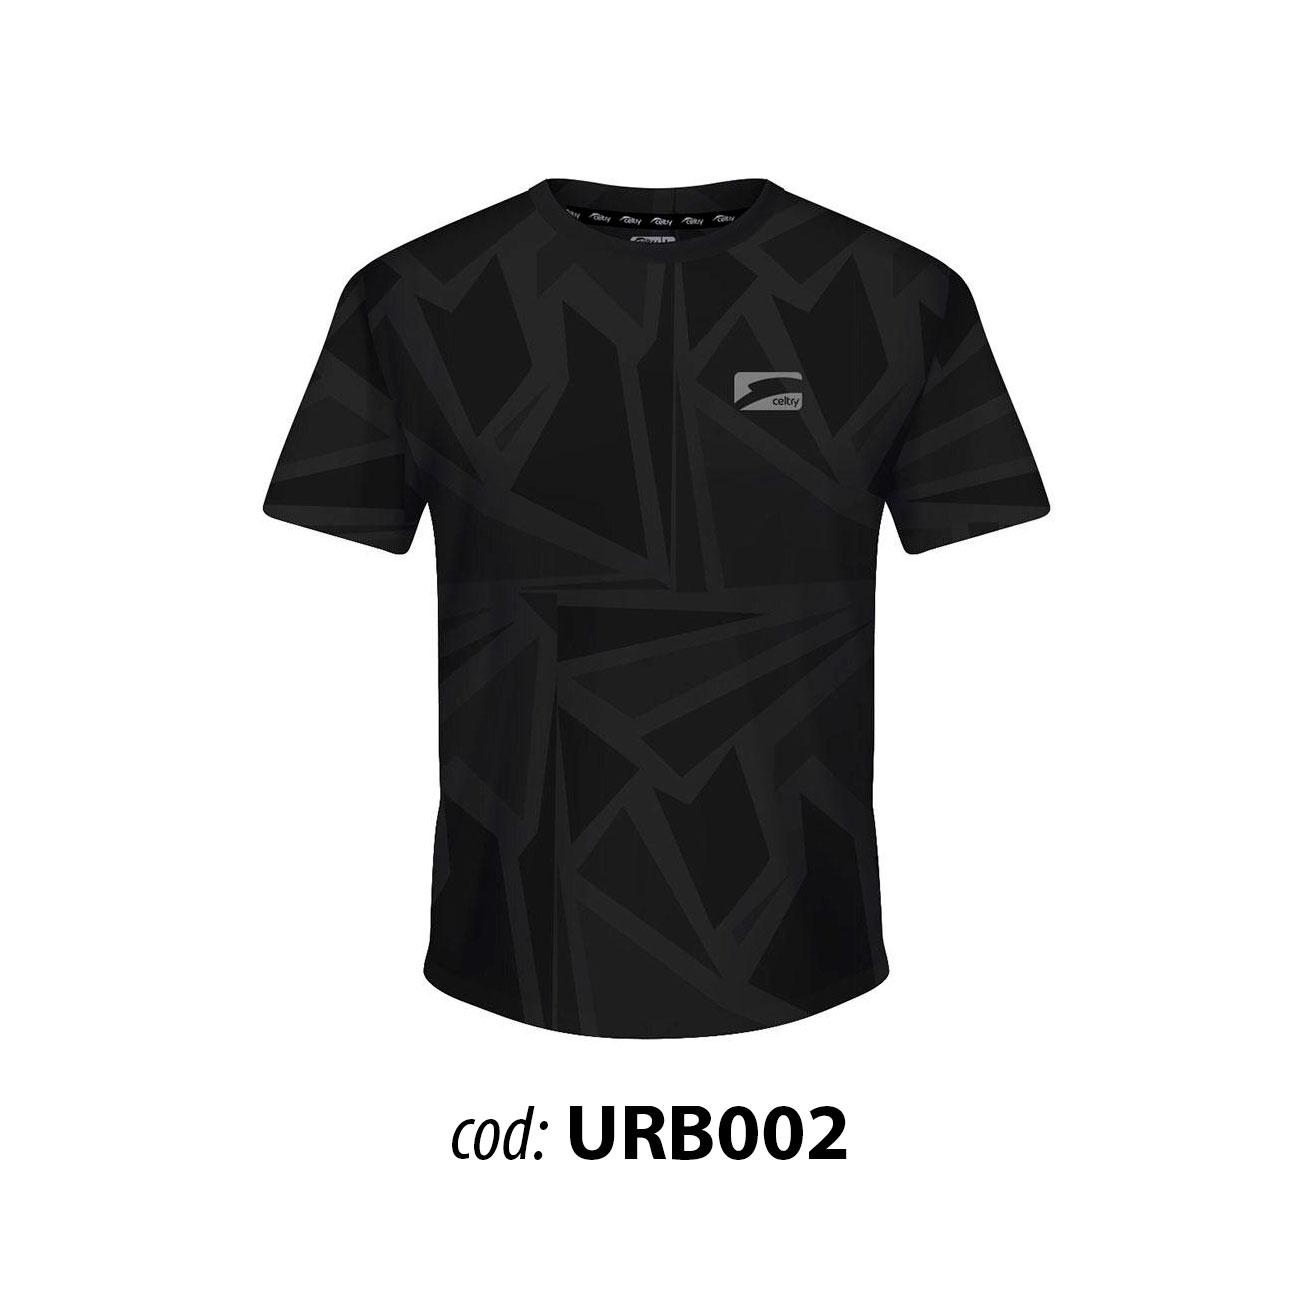 Polera polo Varón    Urbana URB002